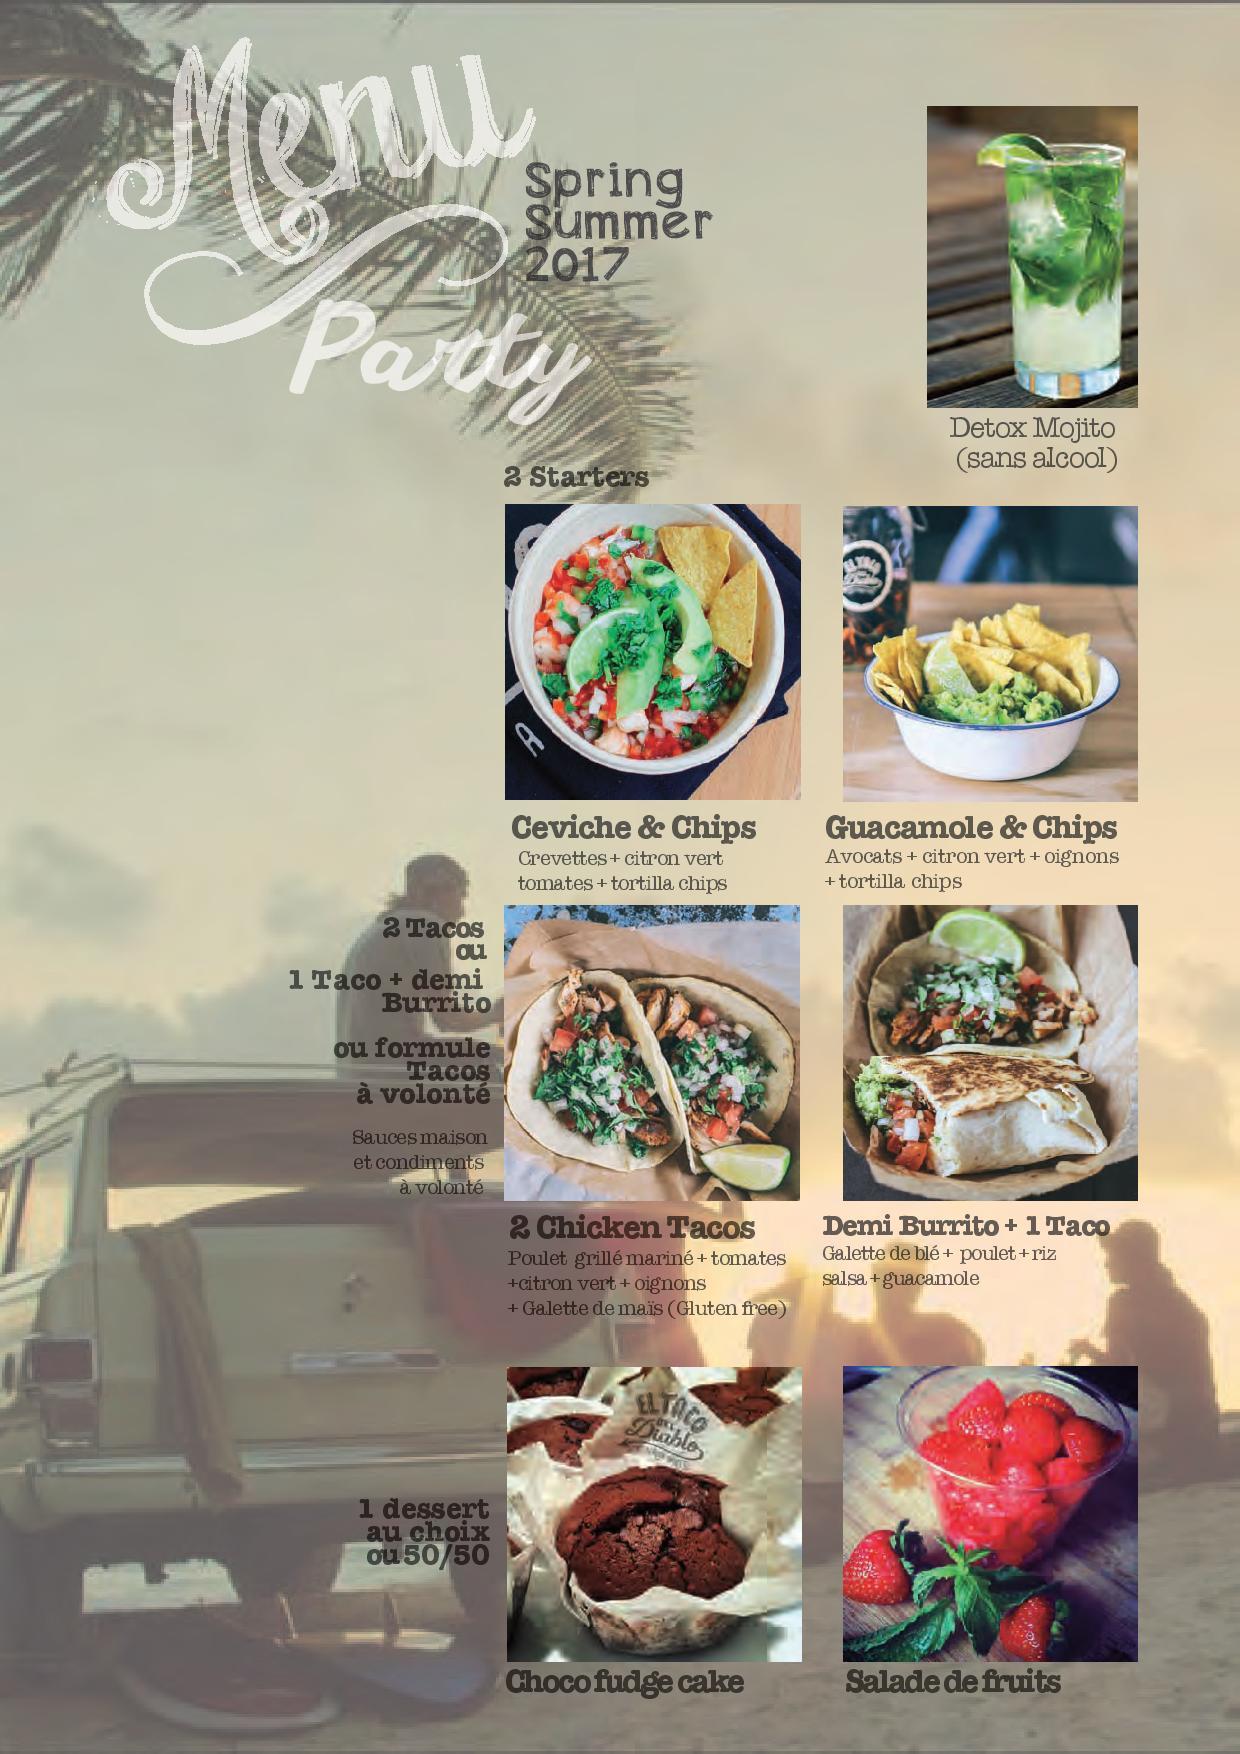 menu-party-2017-page-001